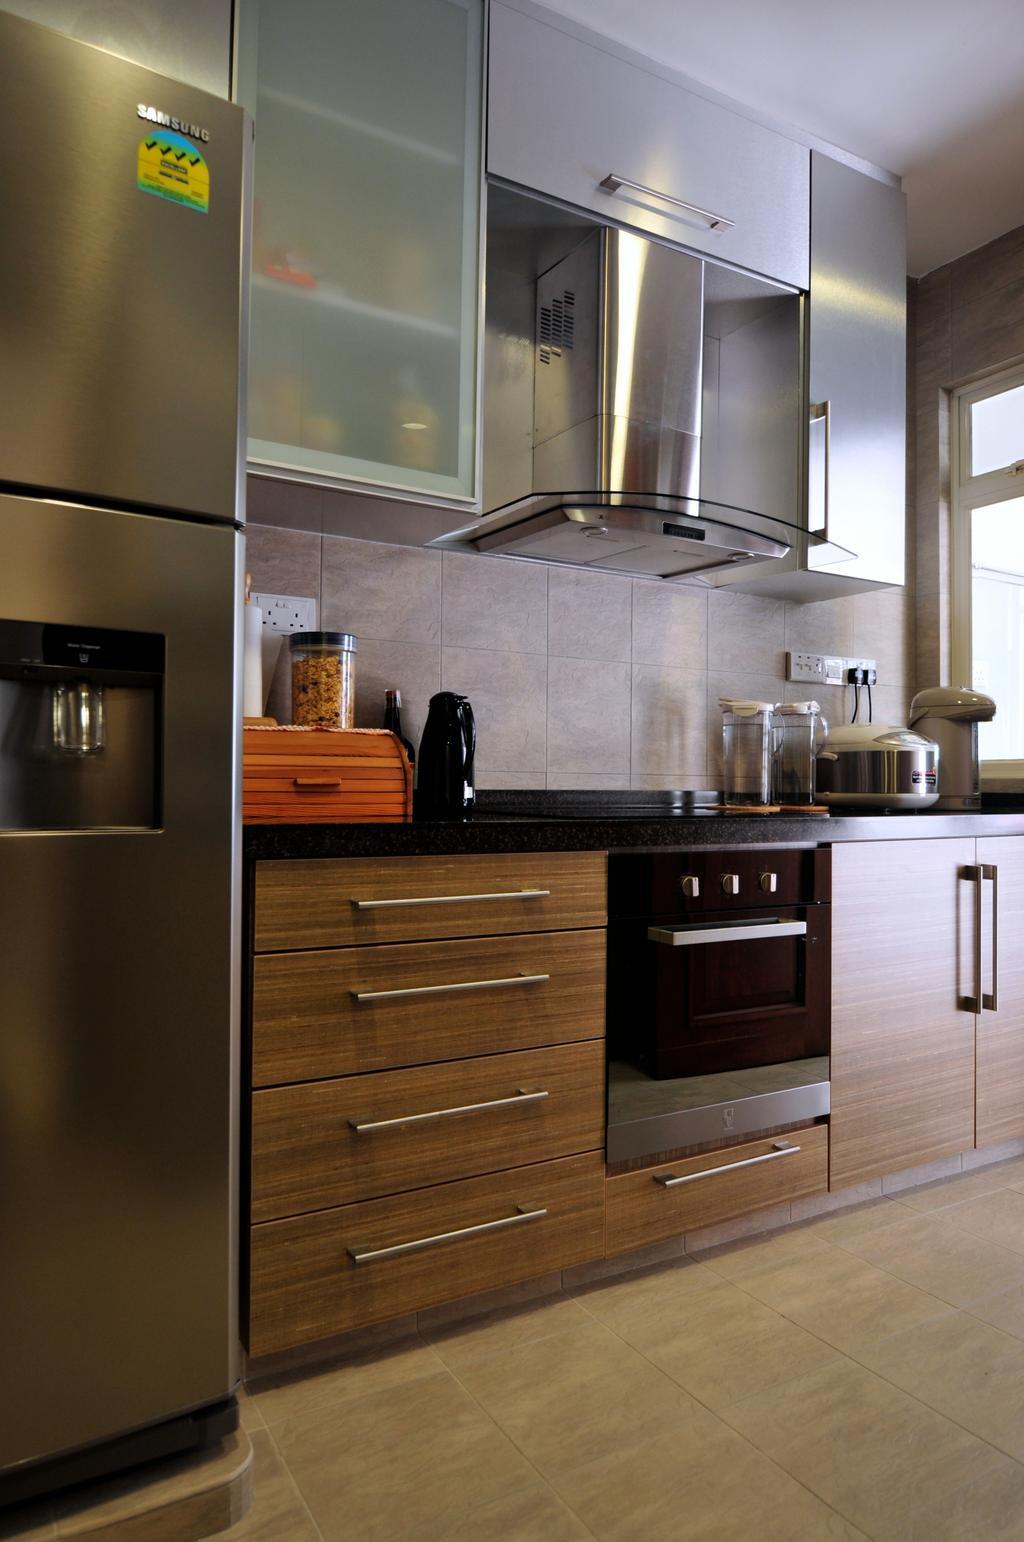 Transitional, Landed, Greenwood Avenue, Interior Designer, Seven Heaven, Indoors, Interior Design, Kitchen, Room, Appliance, Electrical Device, Oven, Fridge, Refrigerator